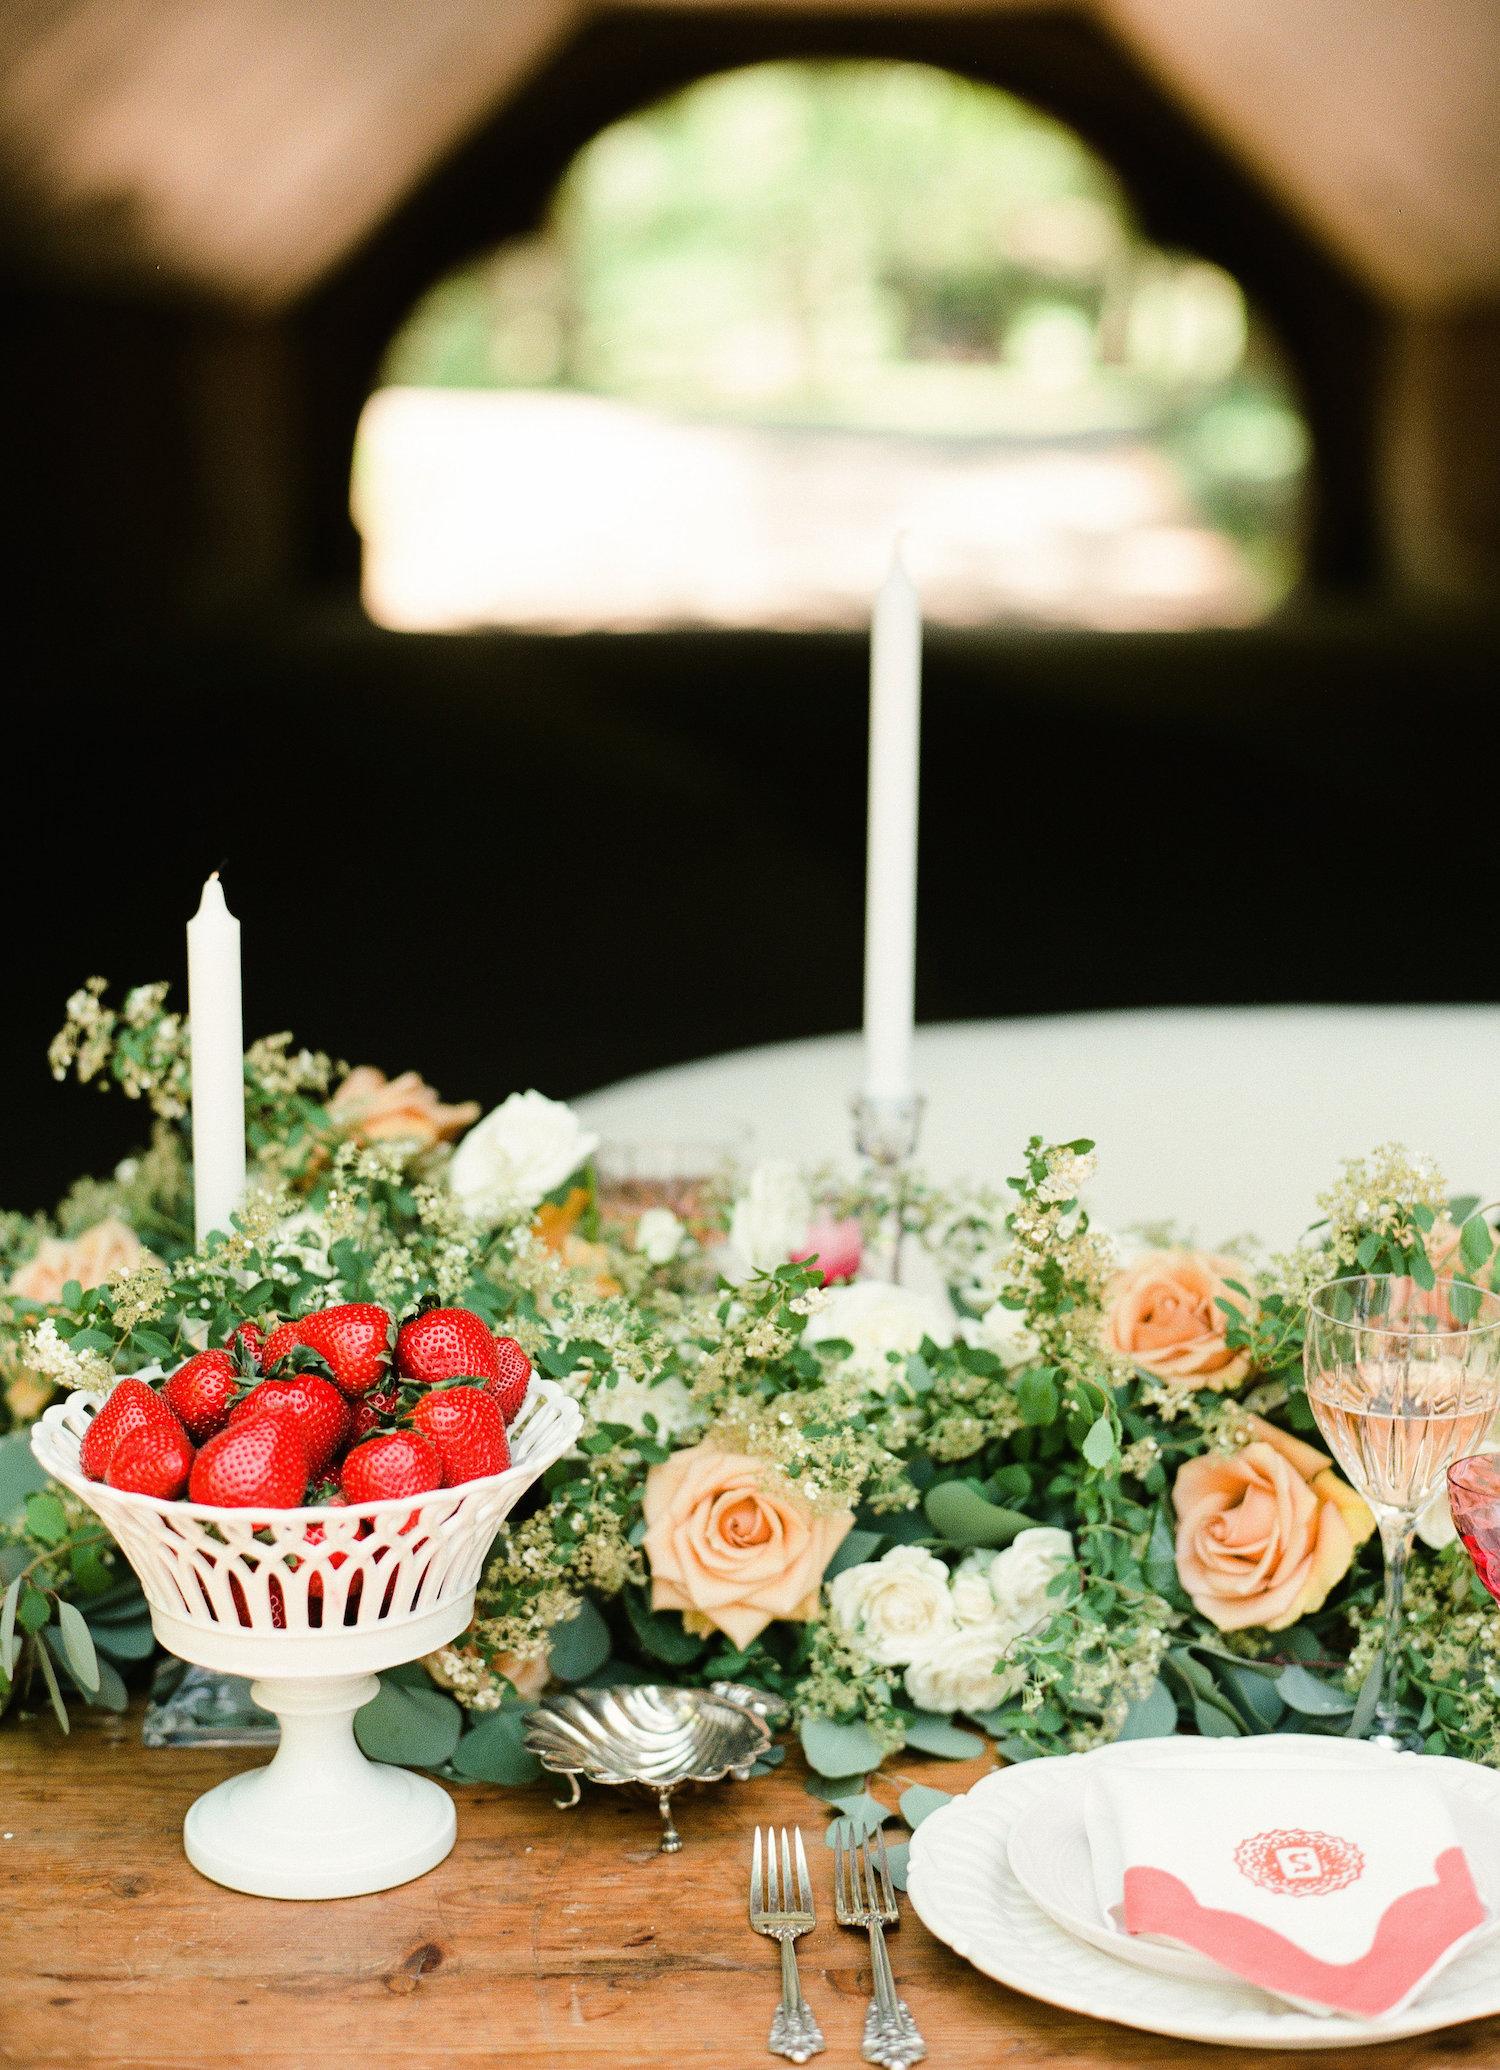 Morning Glow - Full Aperture Floral & Lindsay Madden Photography 84.jpeg